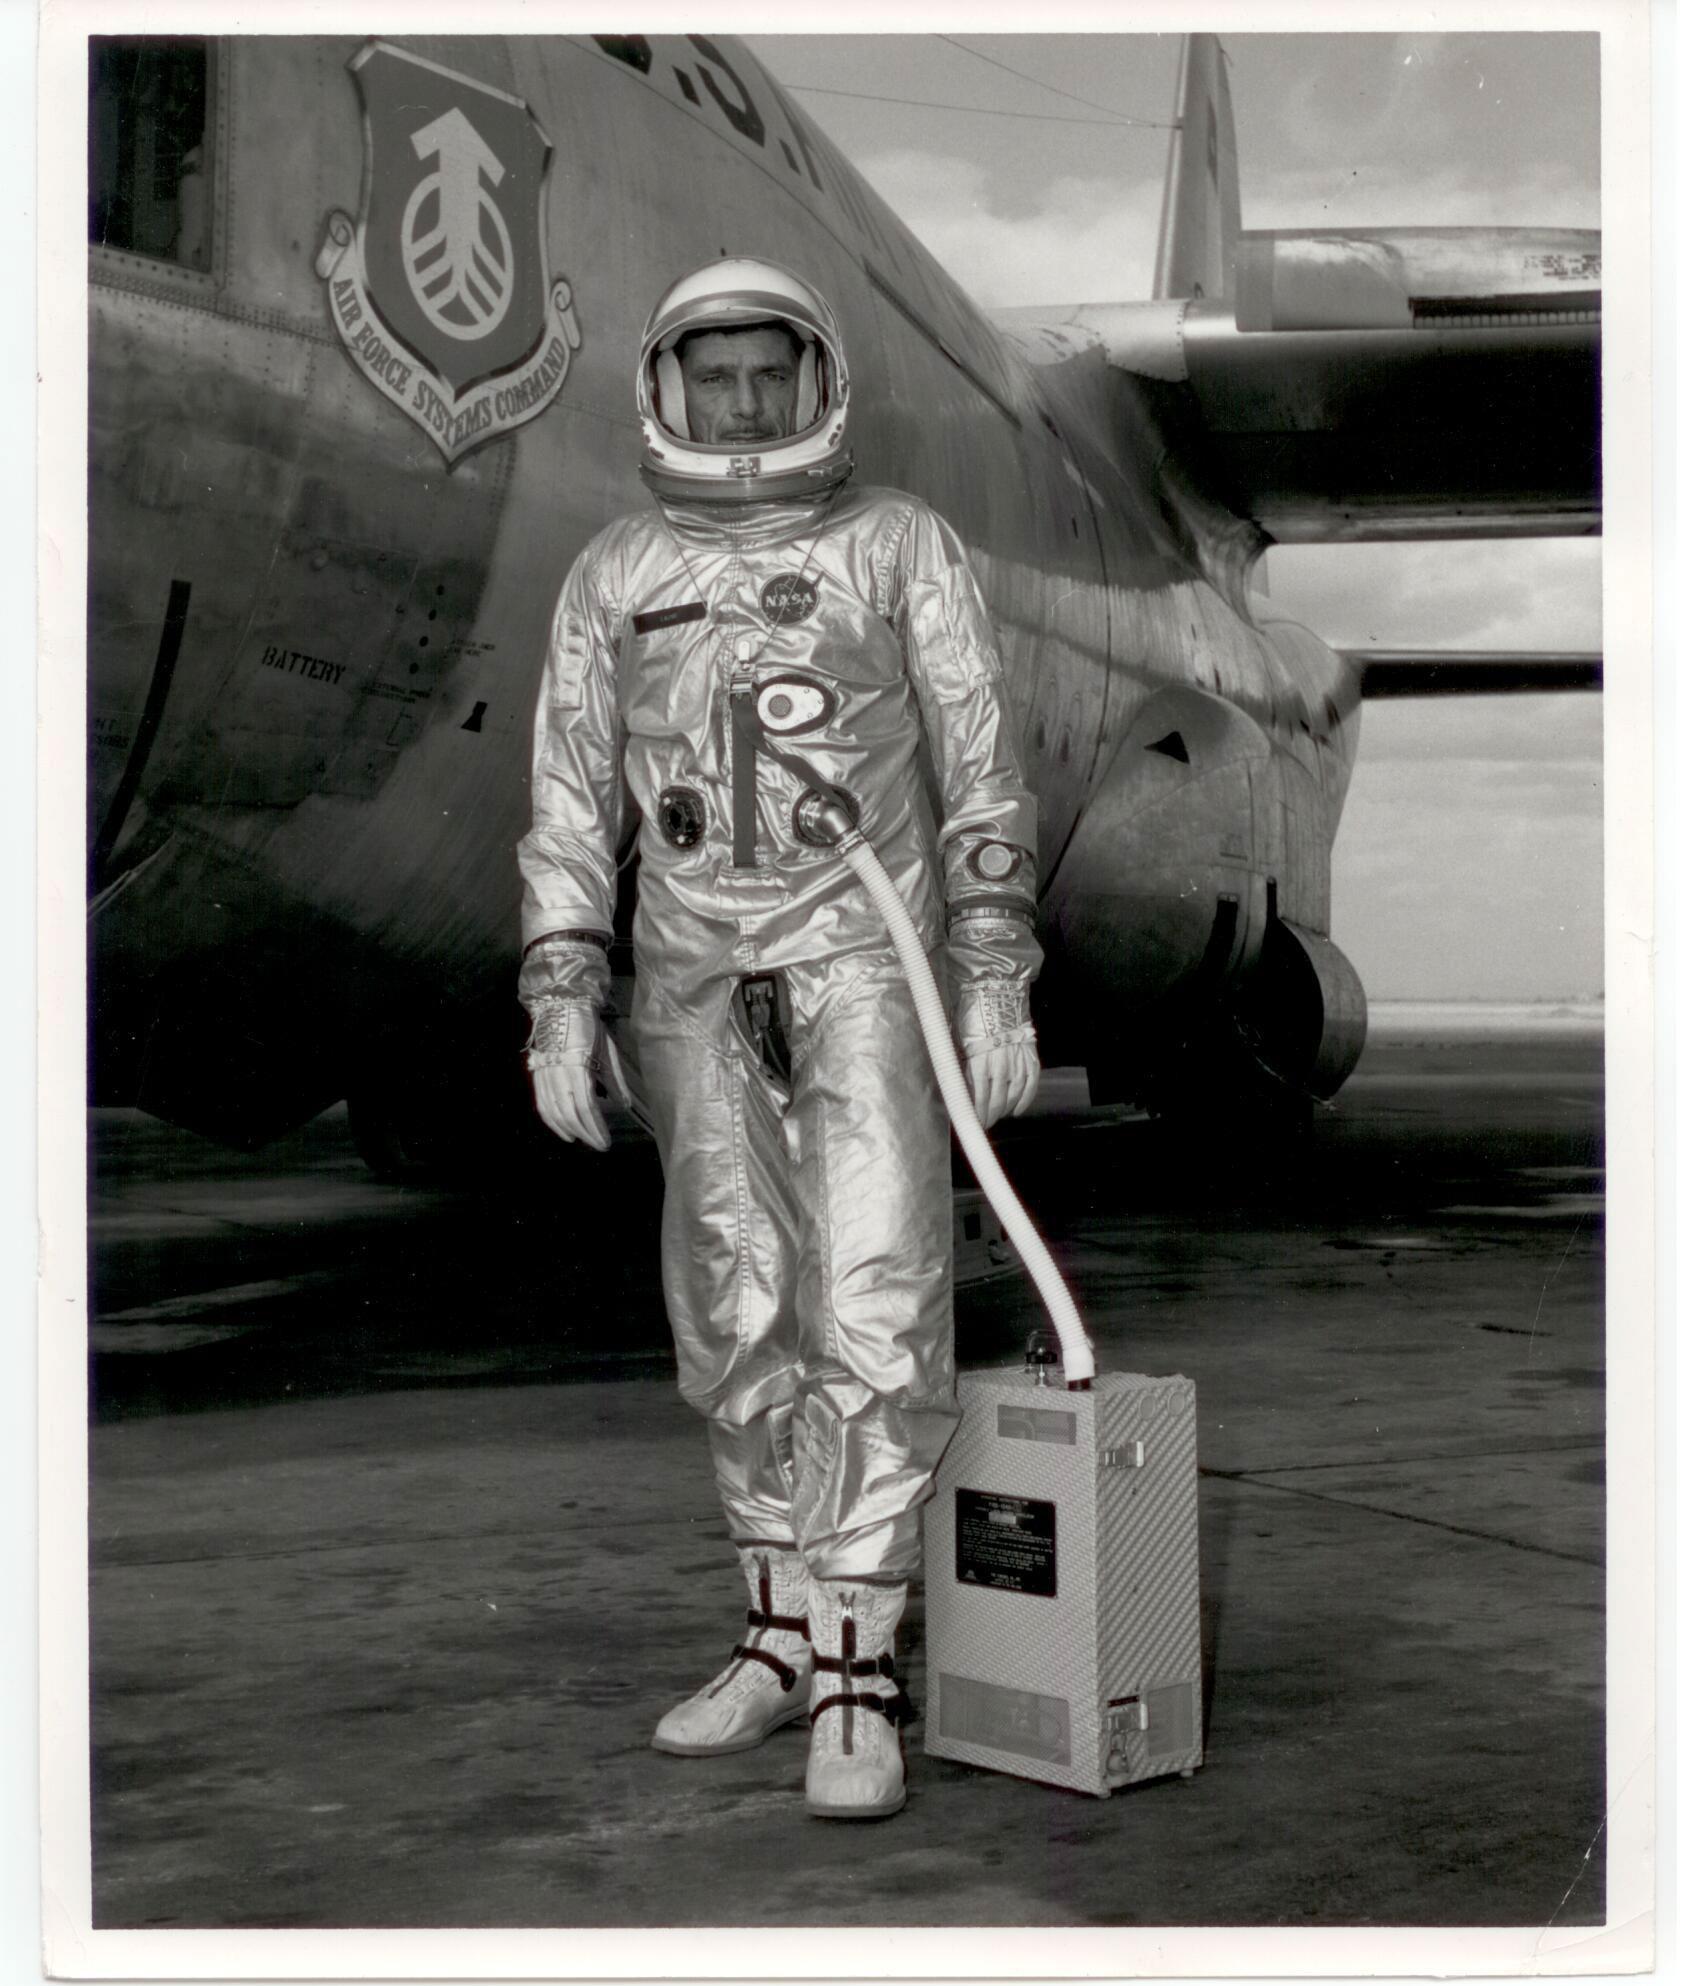 Gemini G2-C training suit (CWO Laine) - collectSPACE: Messages